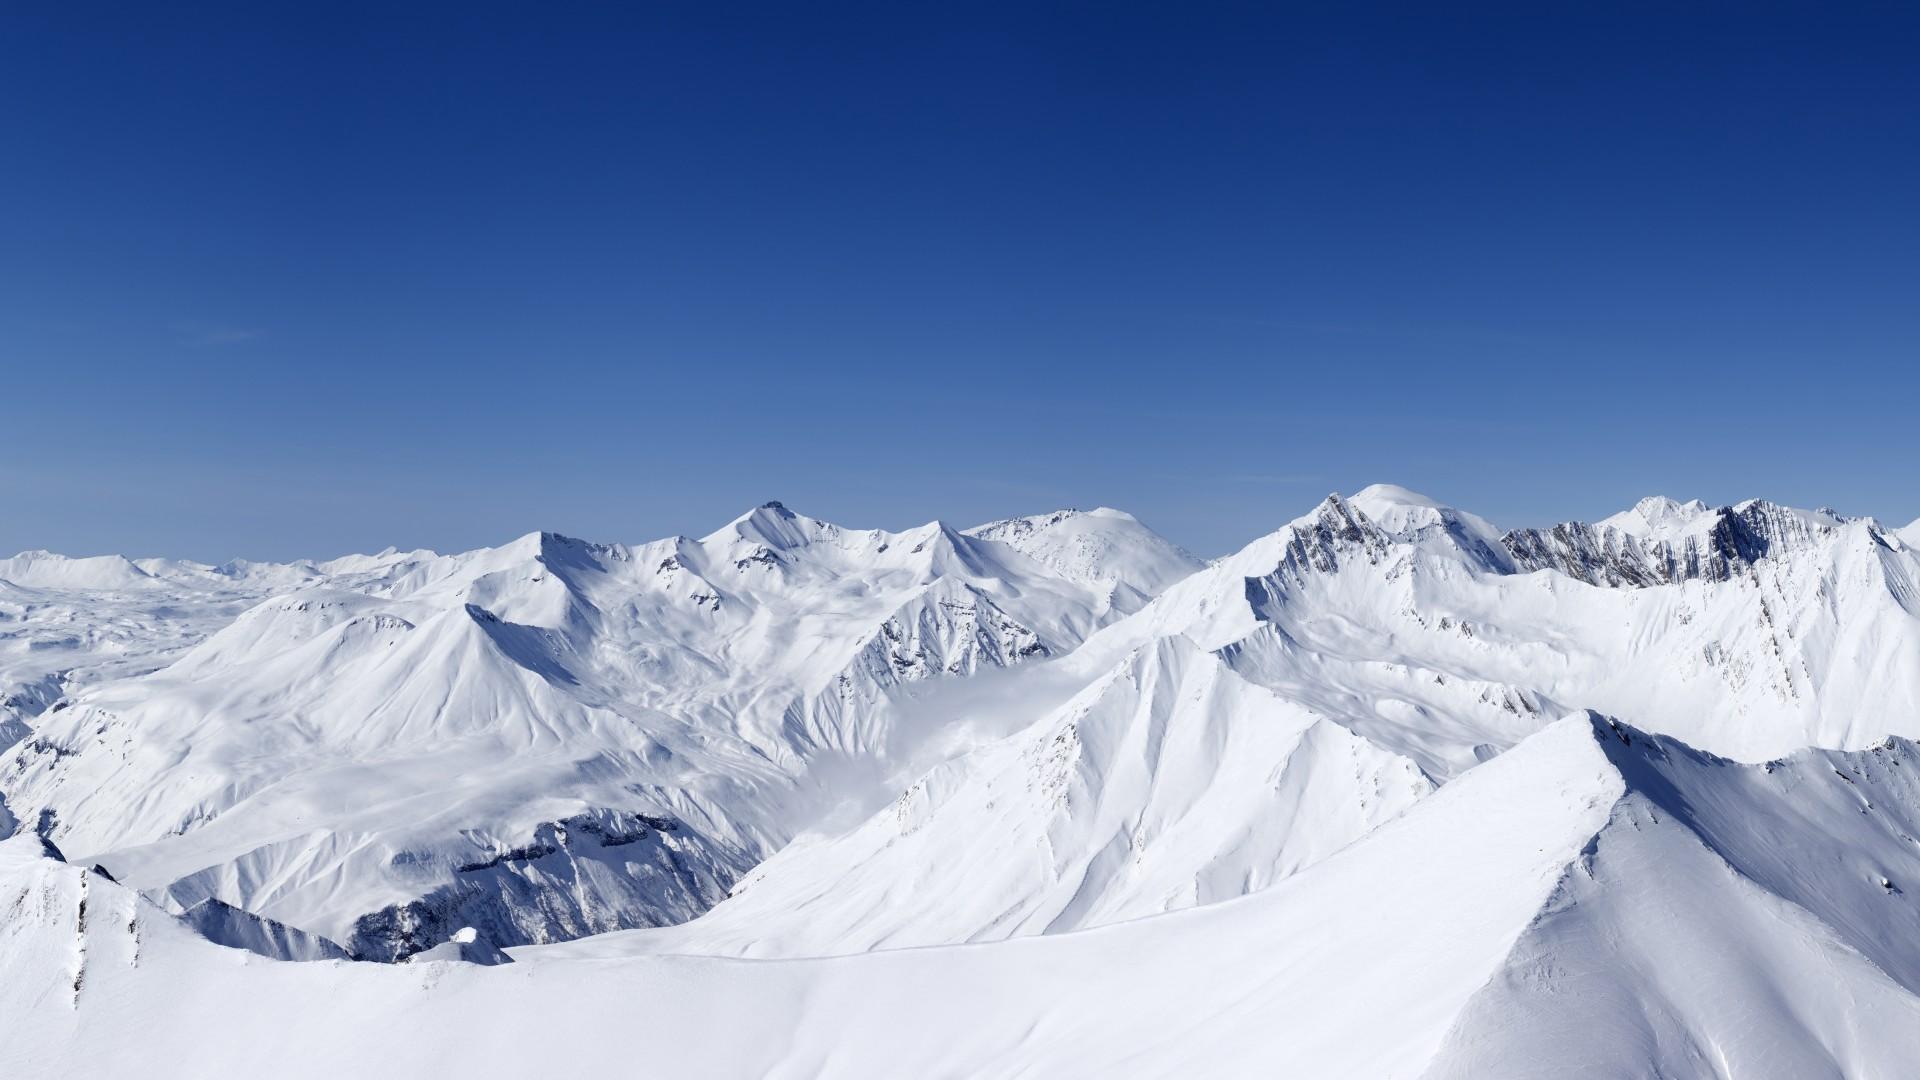 goryi-sneg-vyisoko-nebo